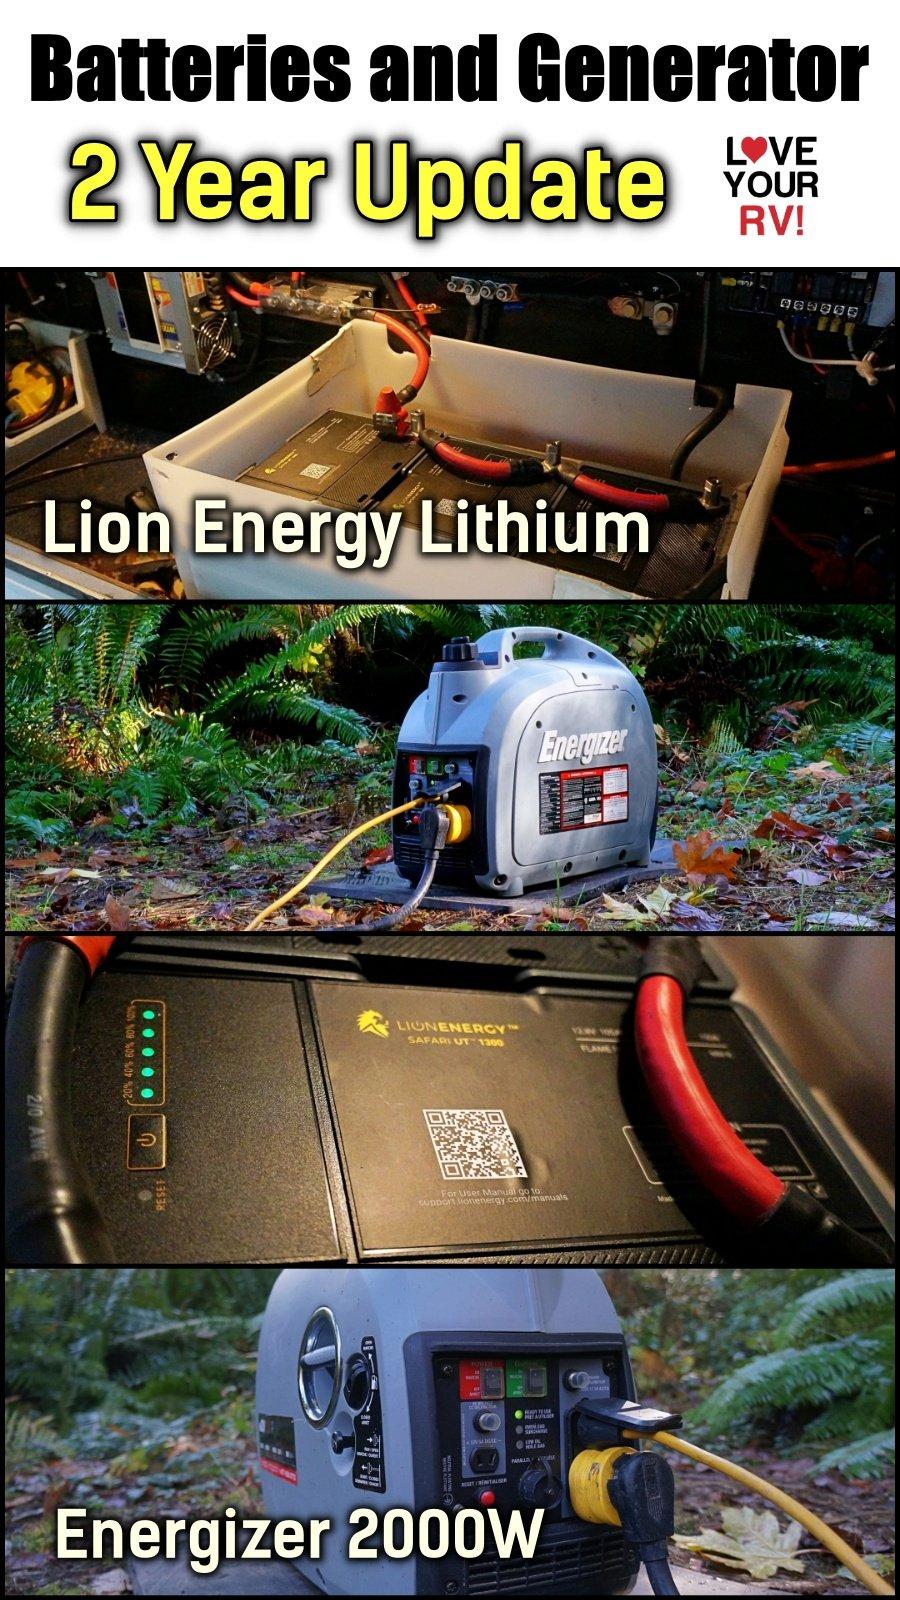 Lion Energy Safari UT1300 Lithium Batteries and Energizer 2000W Generator - 2 Year Review Update Video